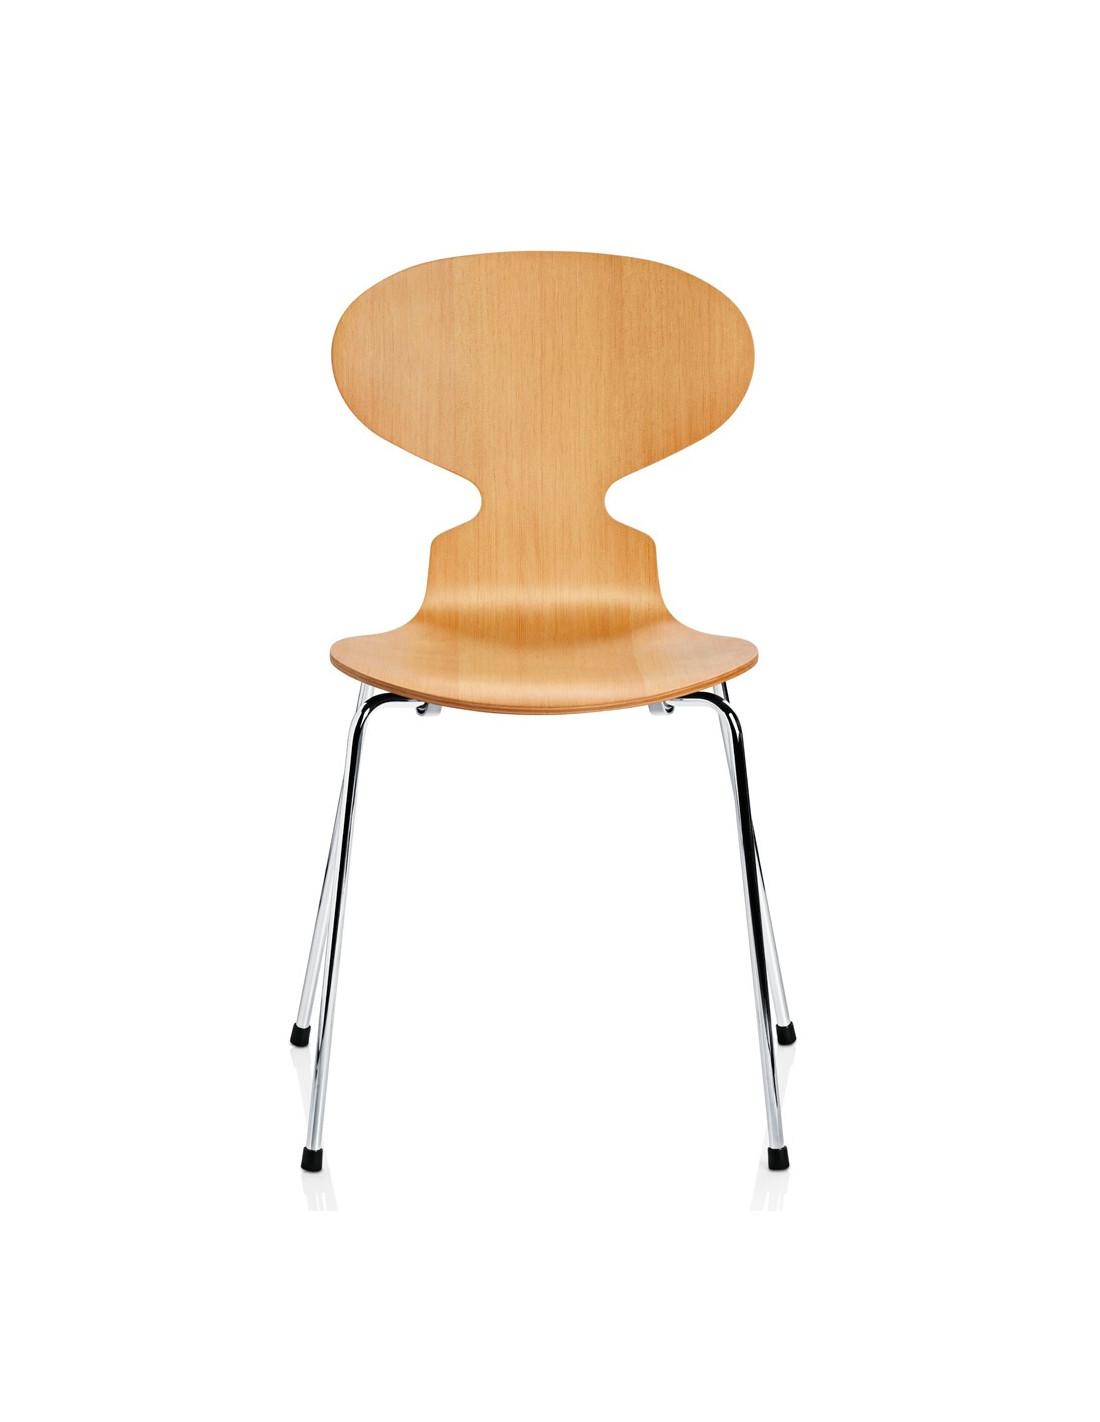 ant chair arne jacobsen design for fritz hansen la boutique danoise. Black Bedroom Furniture Sets. Home Design Ideas